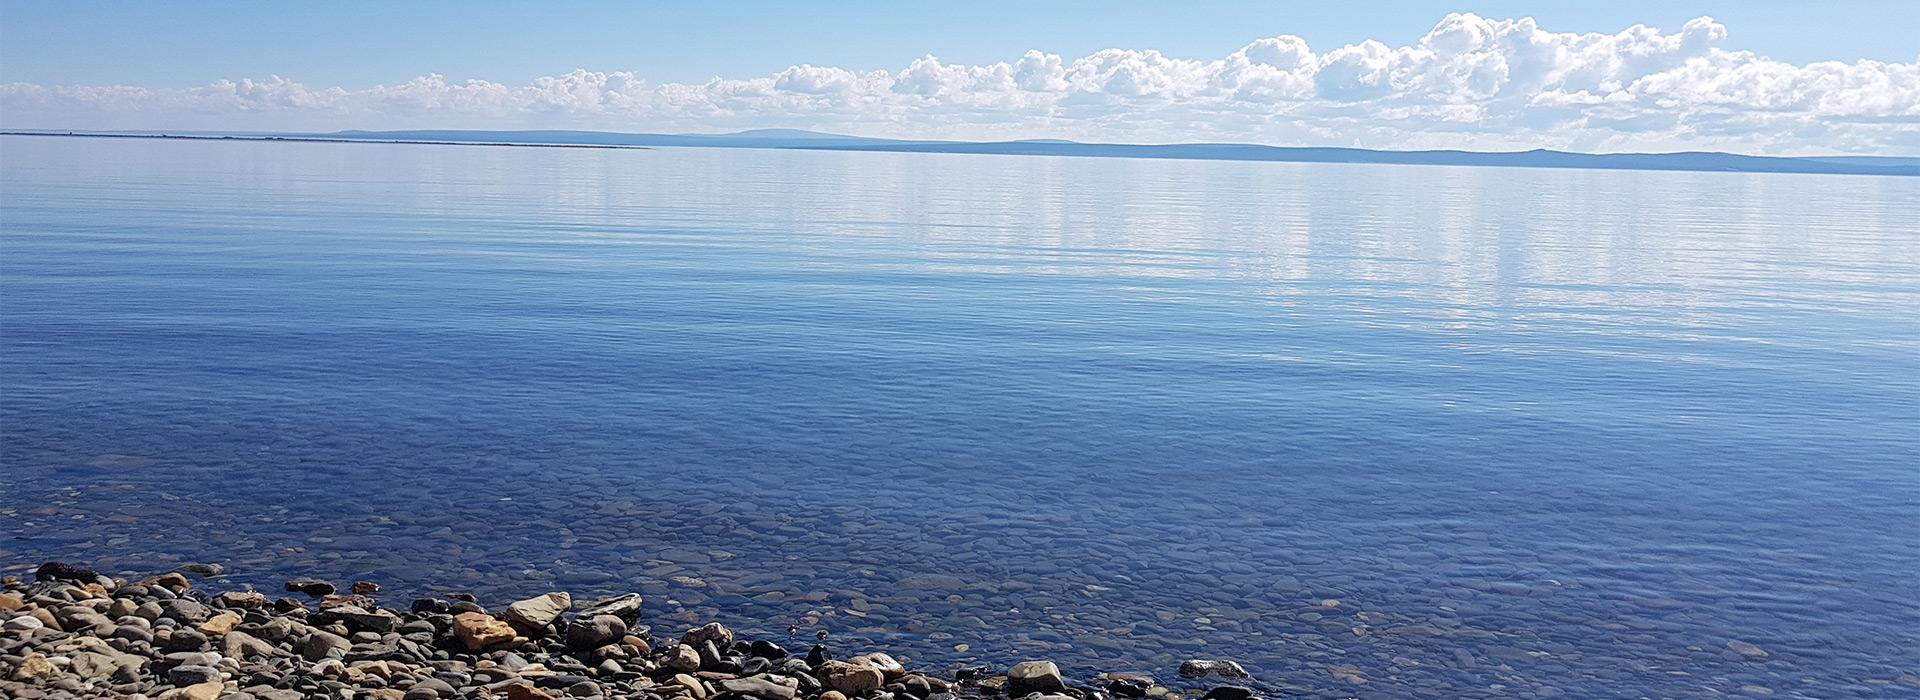 khovsgol-lake-mongolia